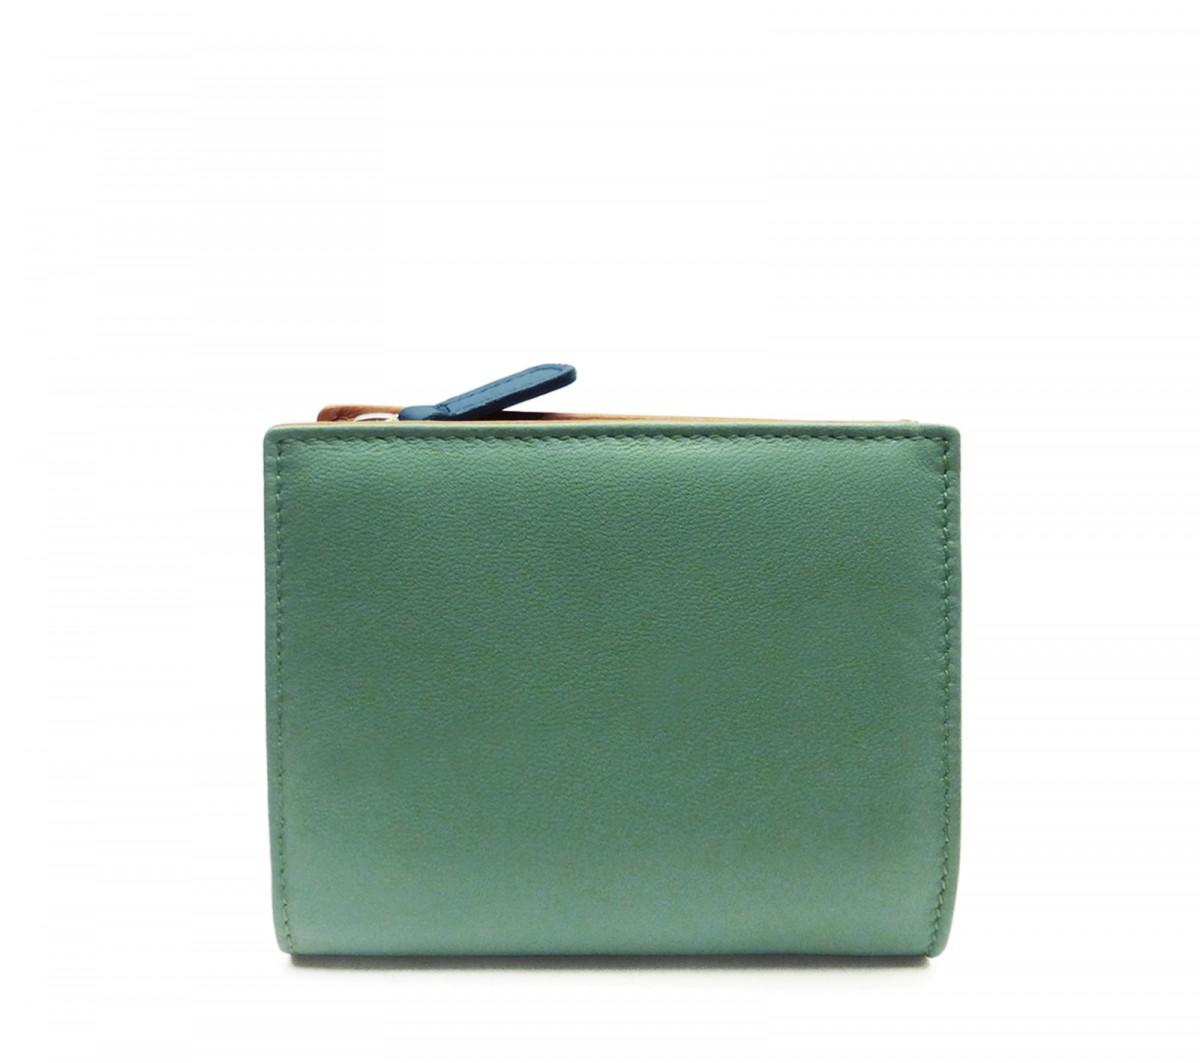 Medium wallet convertibleTroika